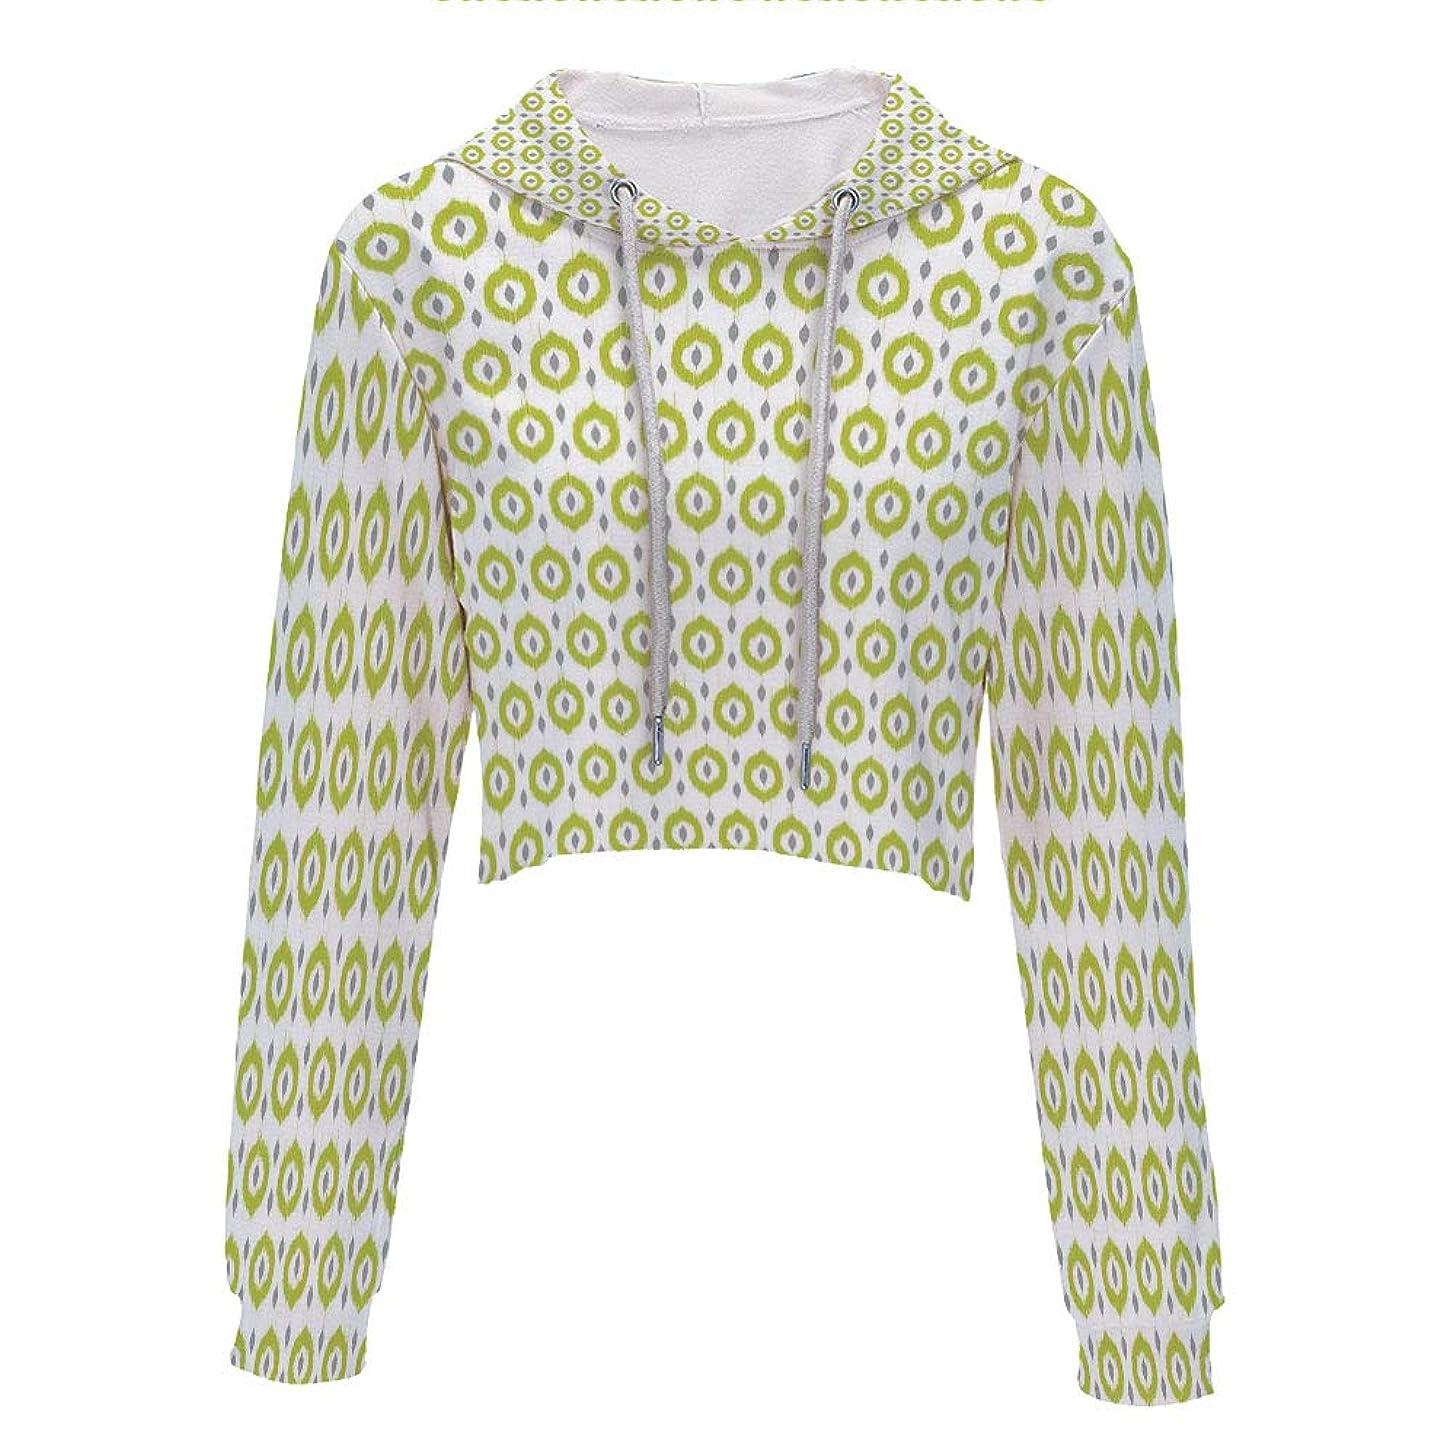 Hooded Sweatshirt Hip hop Clothing for Women S/M MulticolorWatercolor Ice Cream